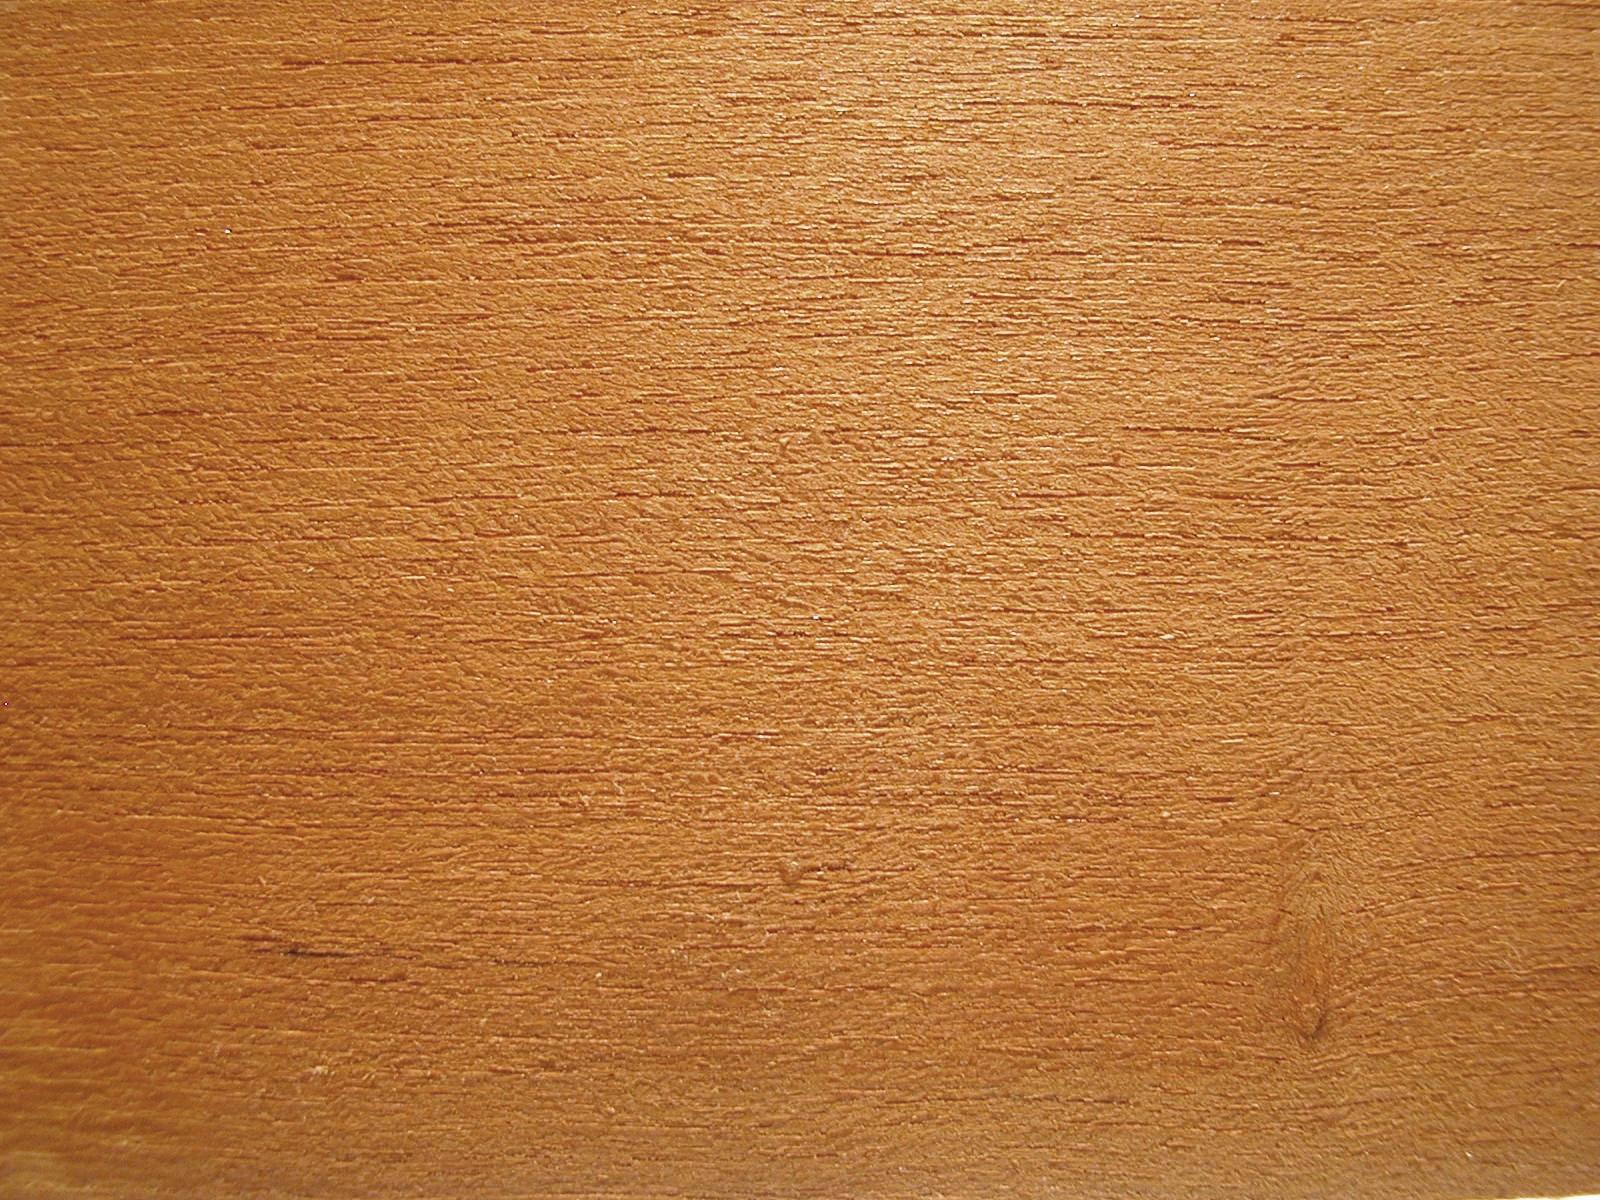 Holz.JPG teak